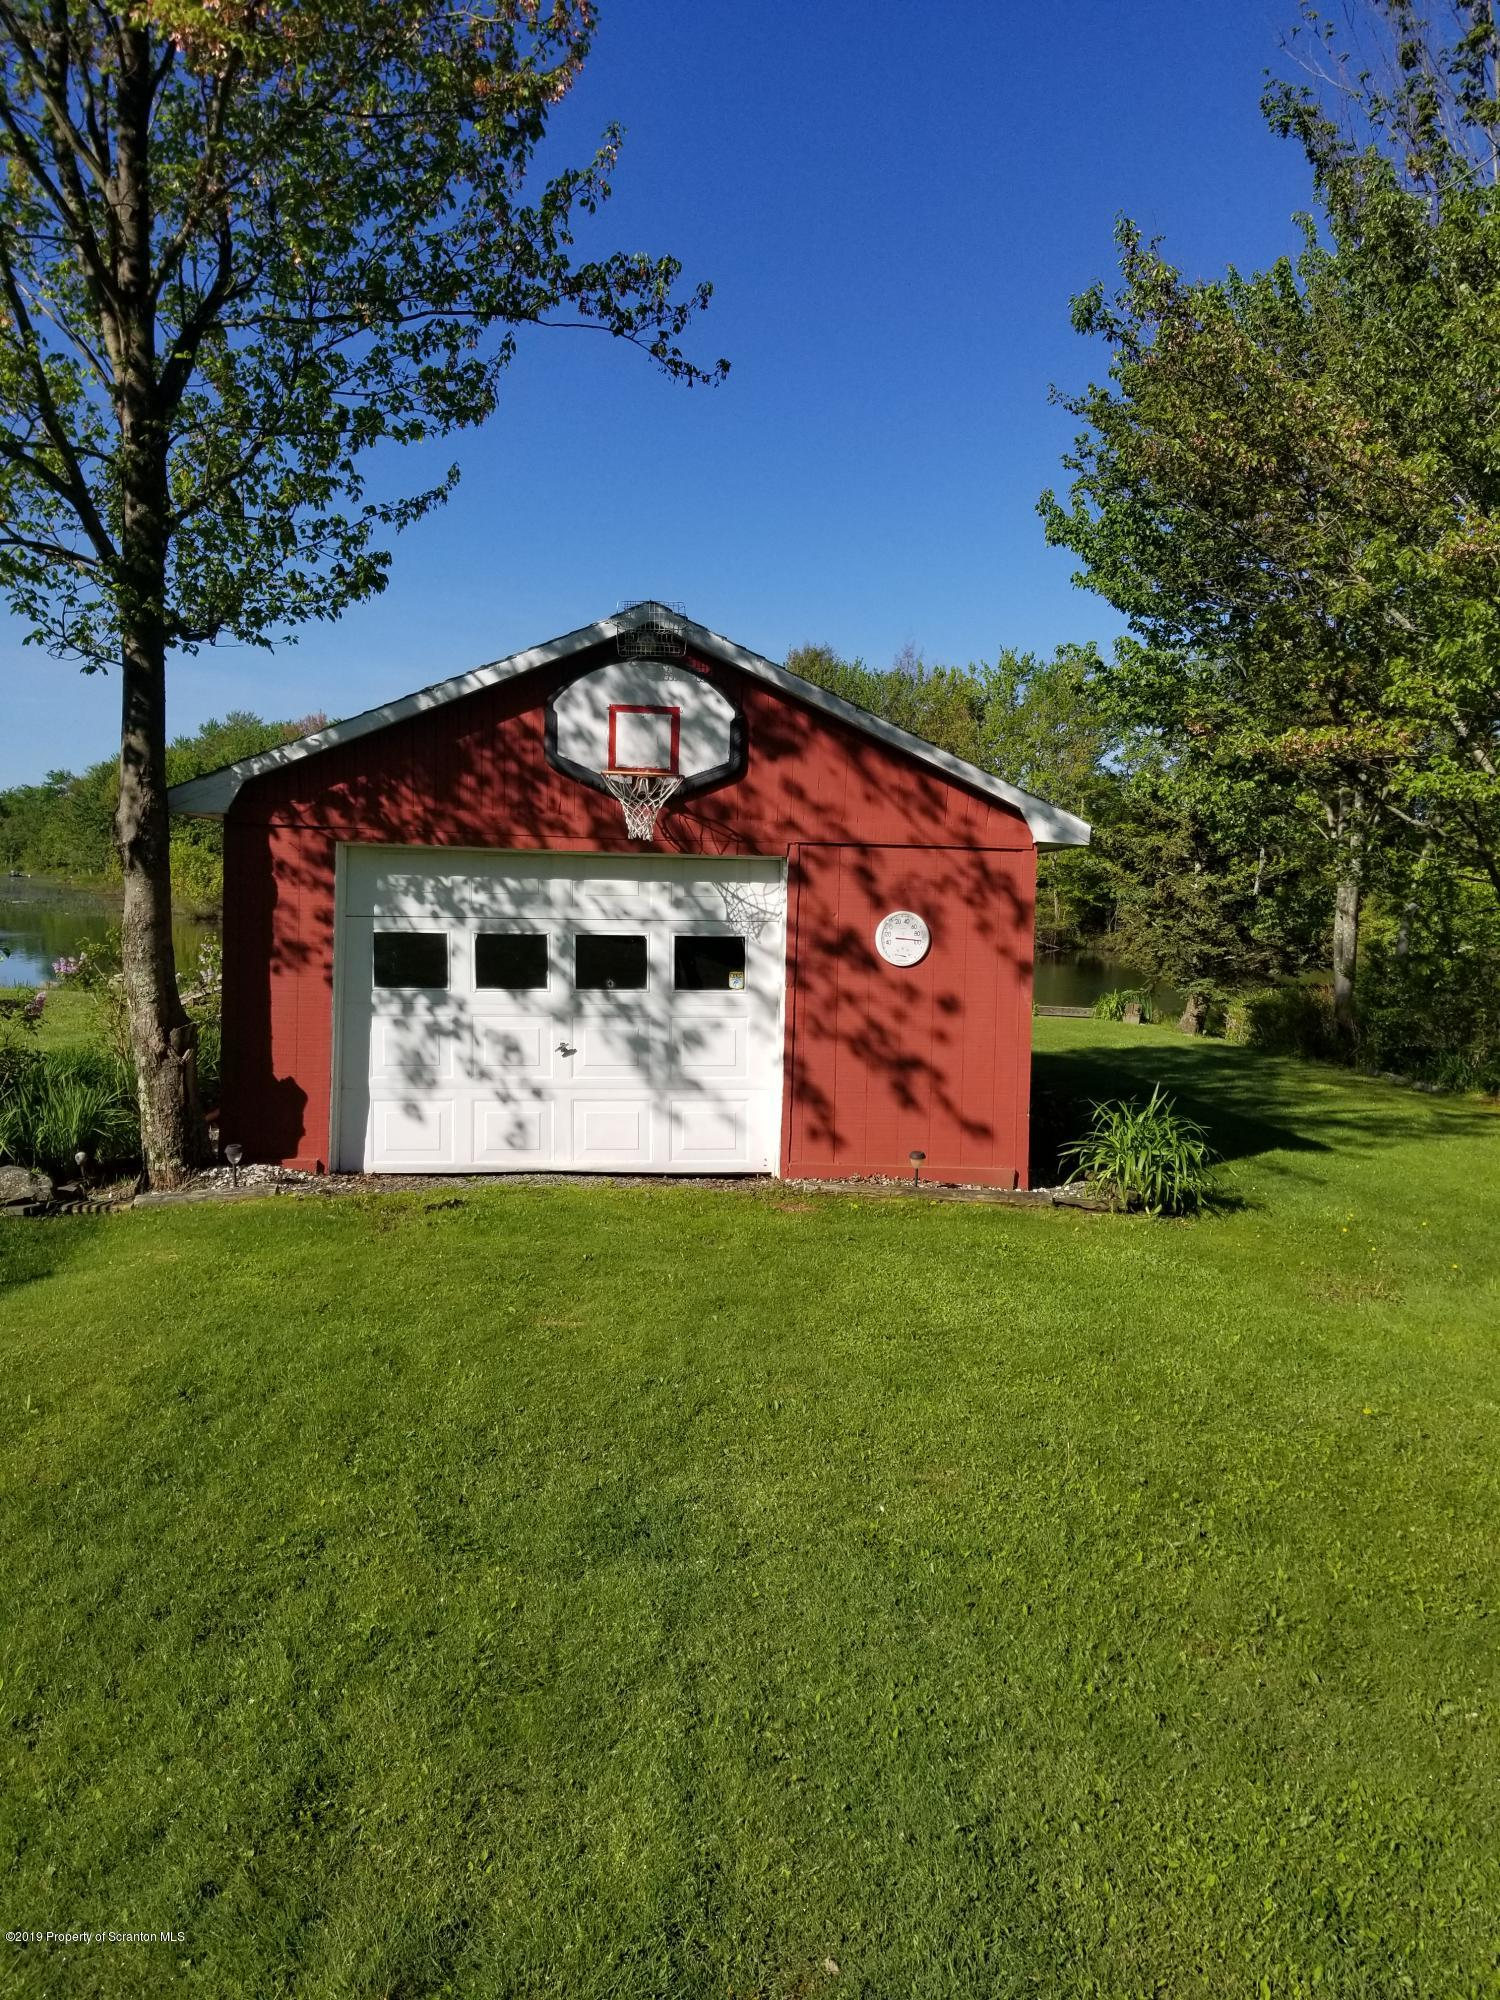 128 Shadyside Dr, Greenfield Twp, Pennsylvania 18407, 2 Bedrooms Bedrooms, 4 Rooms Rooms,1 BathroomBathrooms,Single Family,For Sale,Shadyside,19-2481